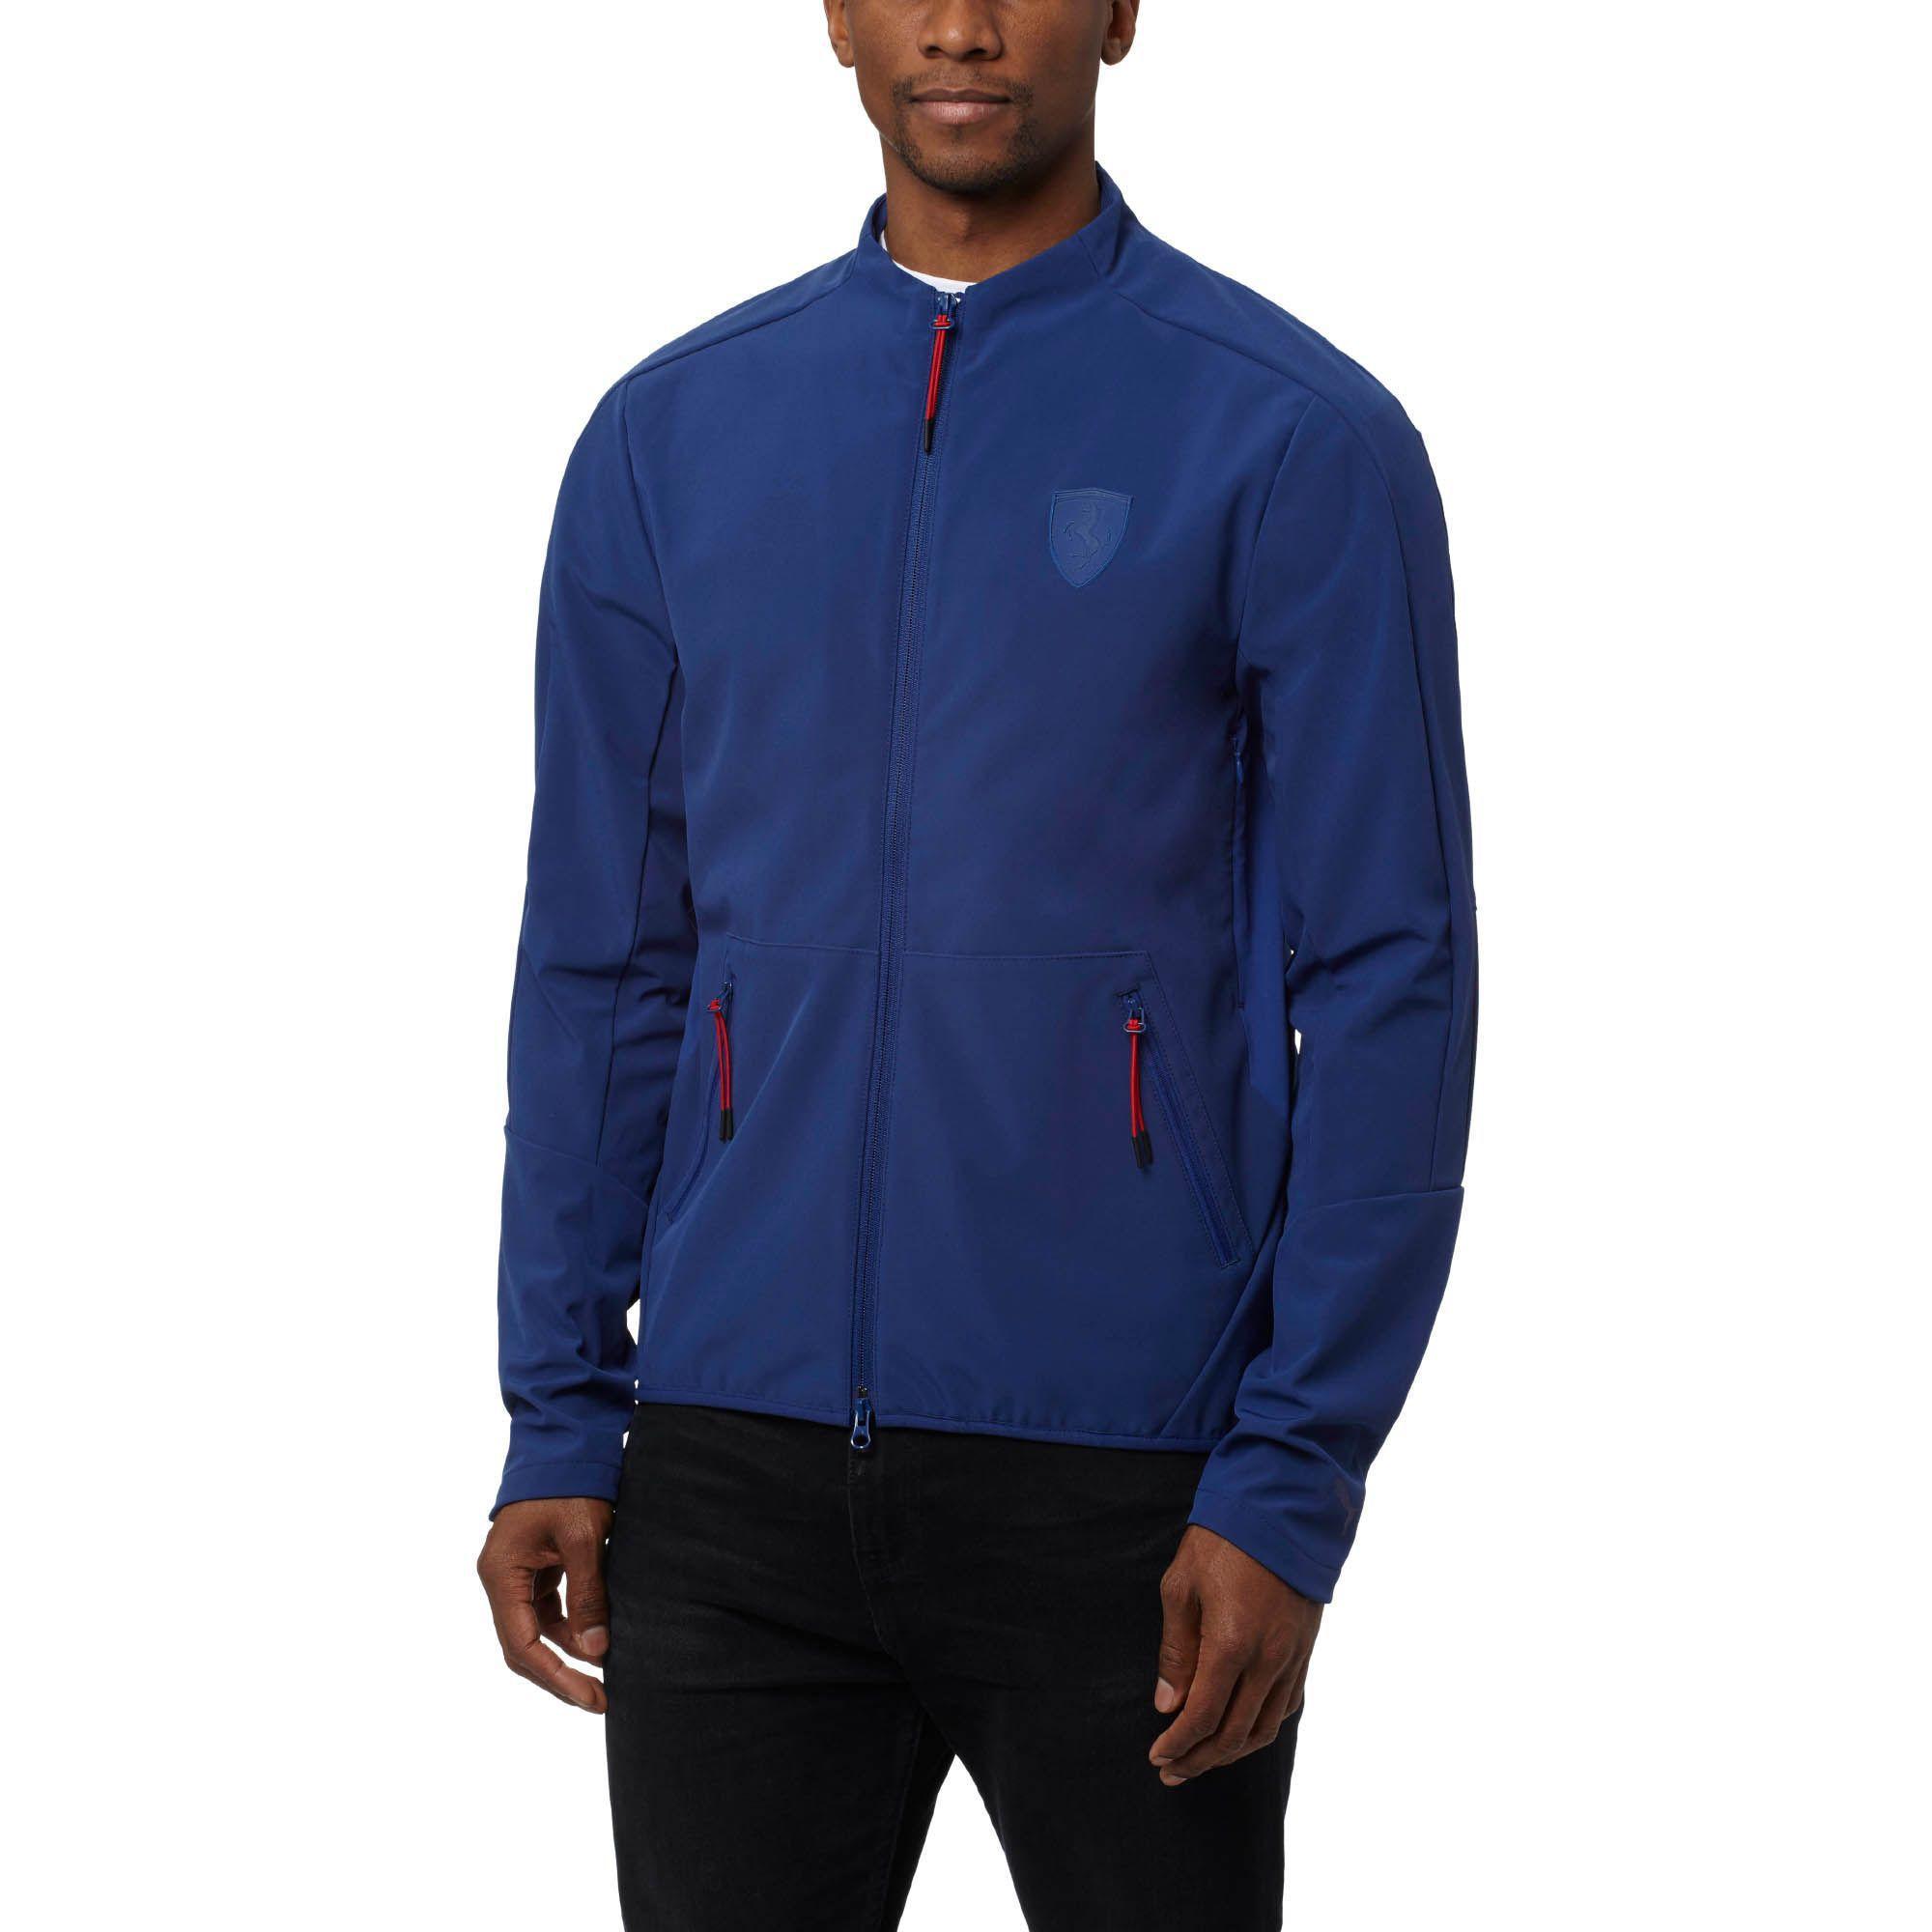 151405b540cb6 PUMA Blue Ferrari T7 Track Jacket for men